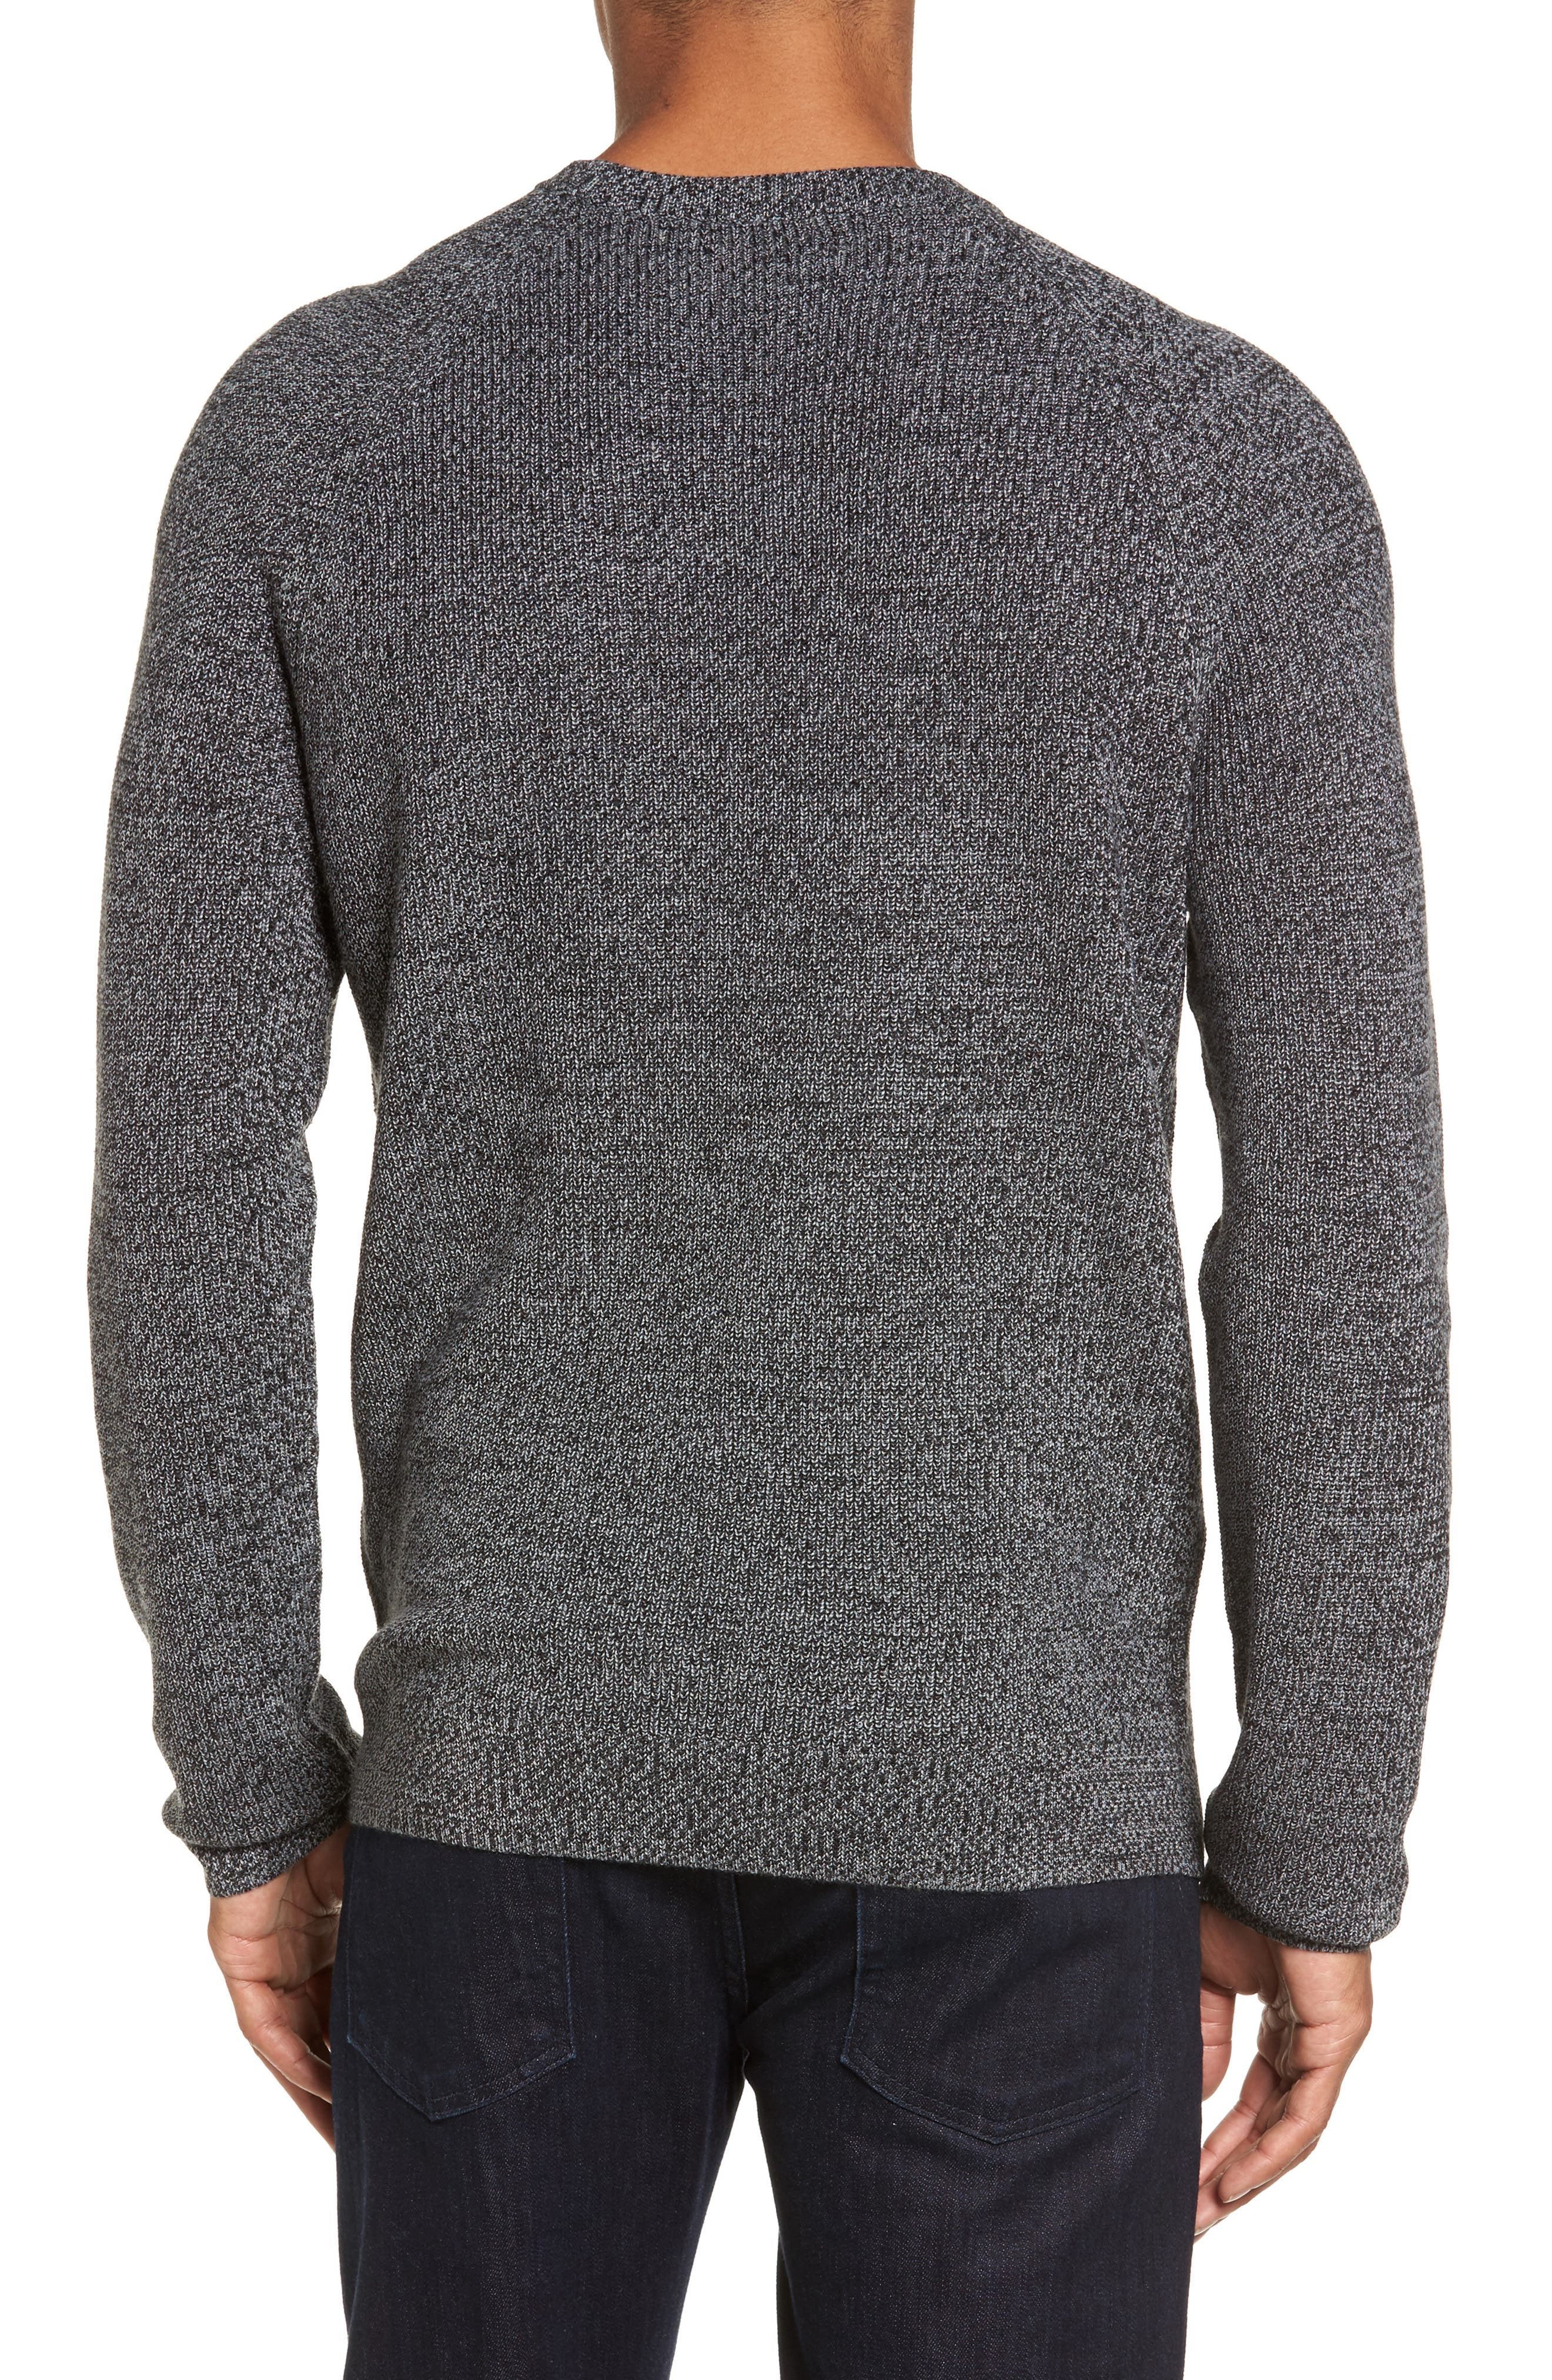 Alternate Image 2  - Nordstrom Men's Shop Textured Merino Wool Blend Sweater